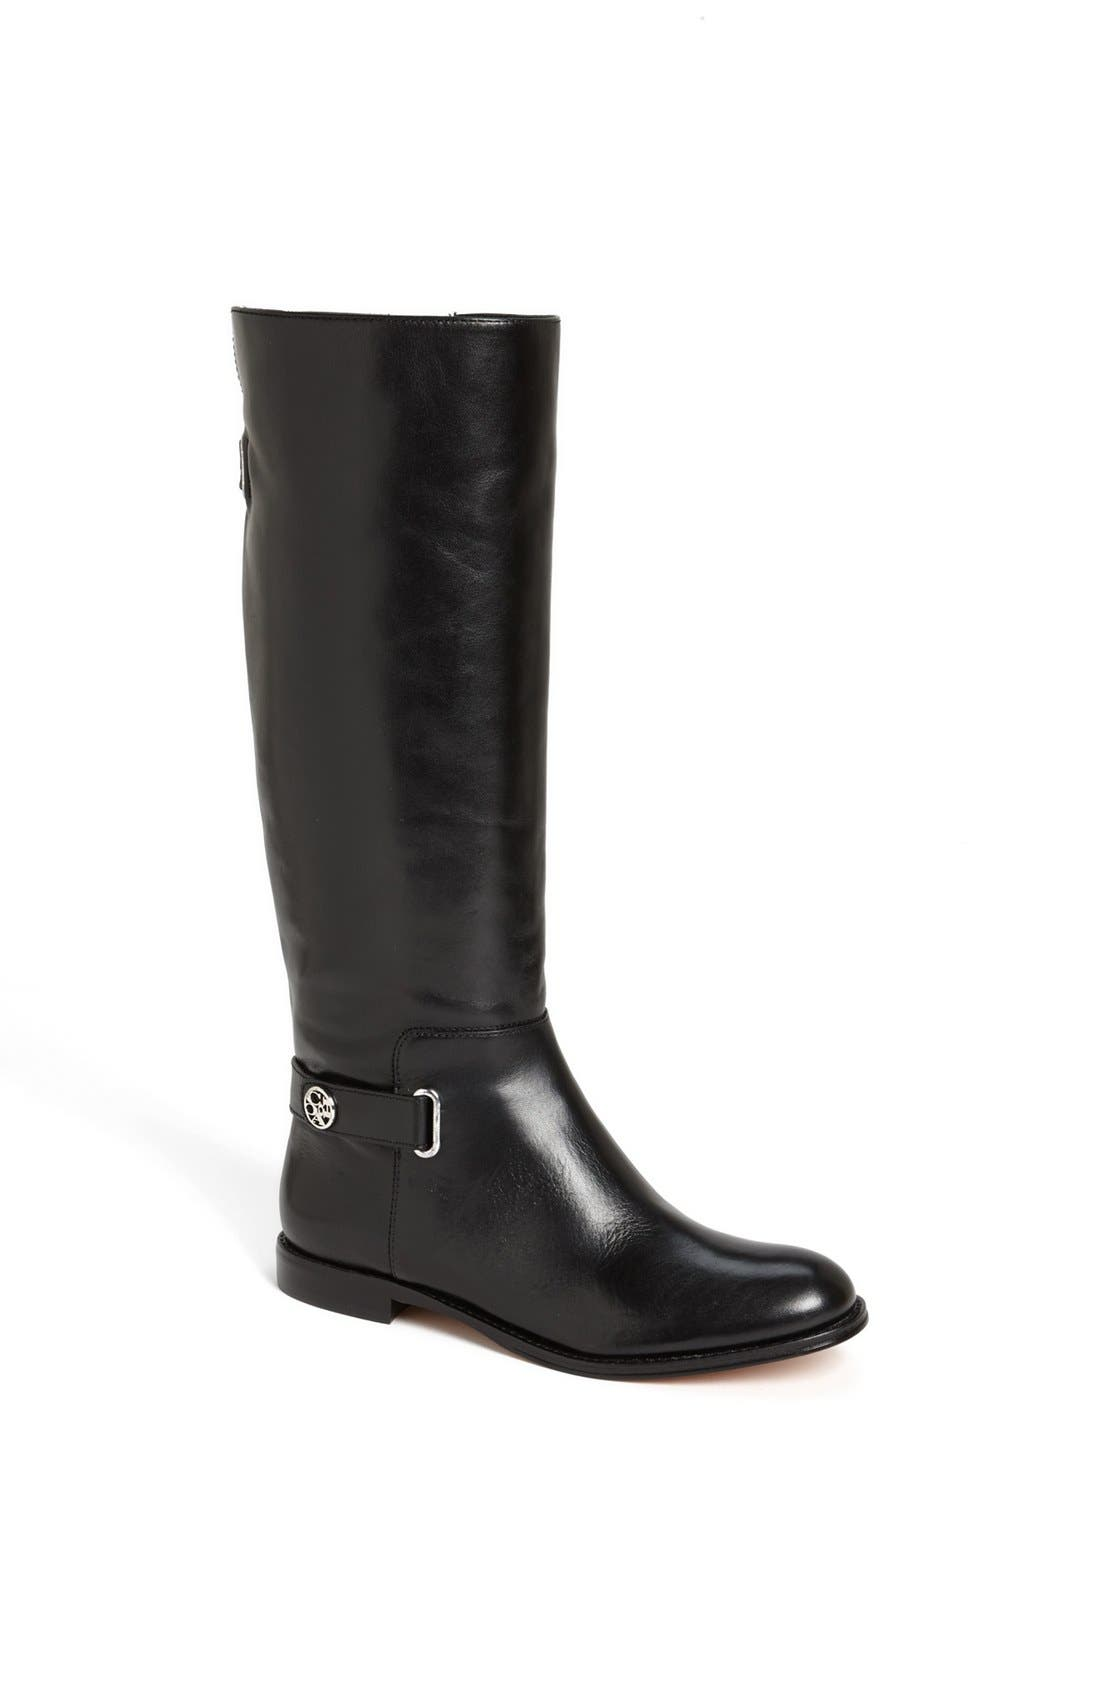 Alternate Image 1 Selected - COACH 'Marina' Boot